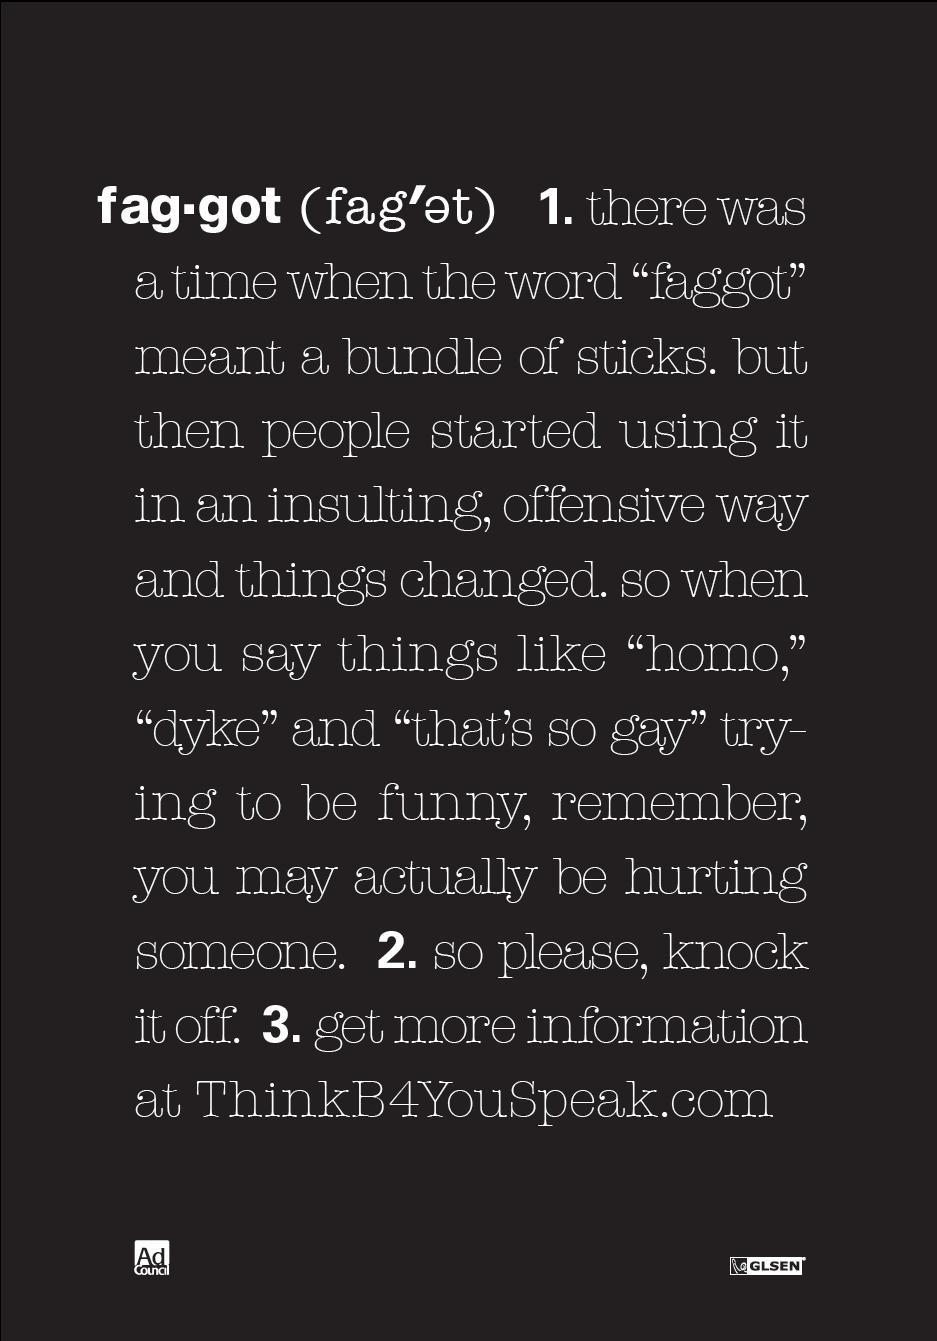 Faggot Definition